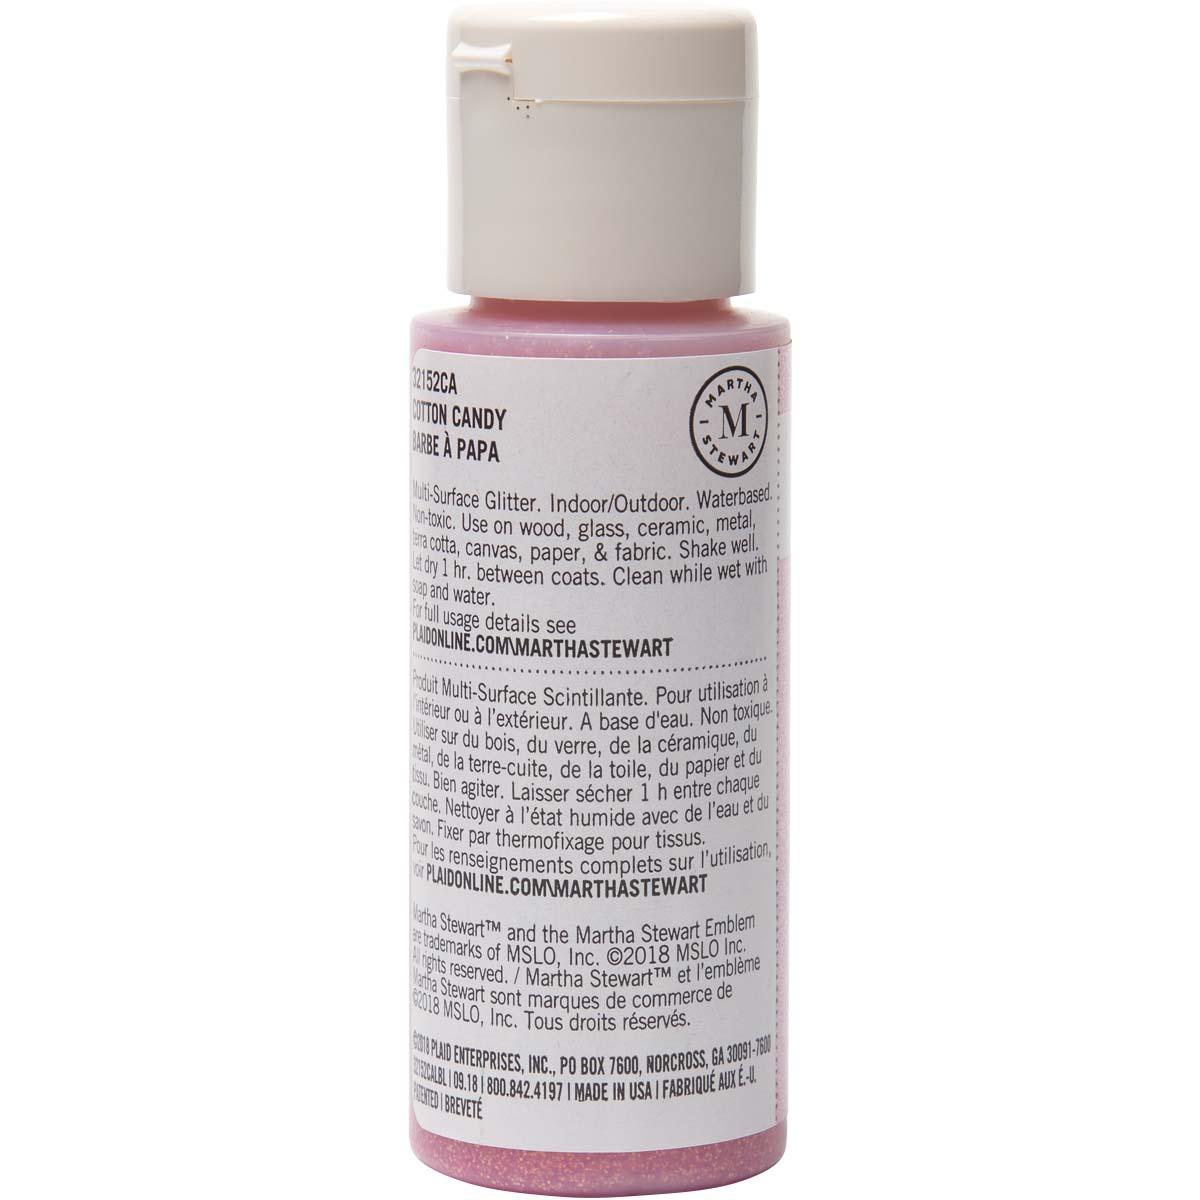 Martha Stewart ® Multi-Surface Glitter Acrylic Craft Paint - Cotton Candy, 2 oz. - 32152CA